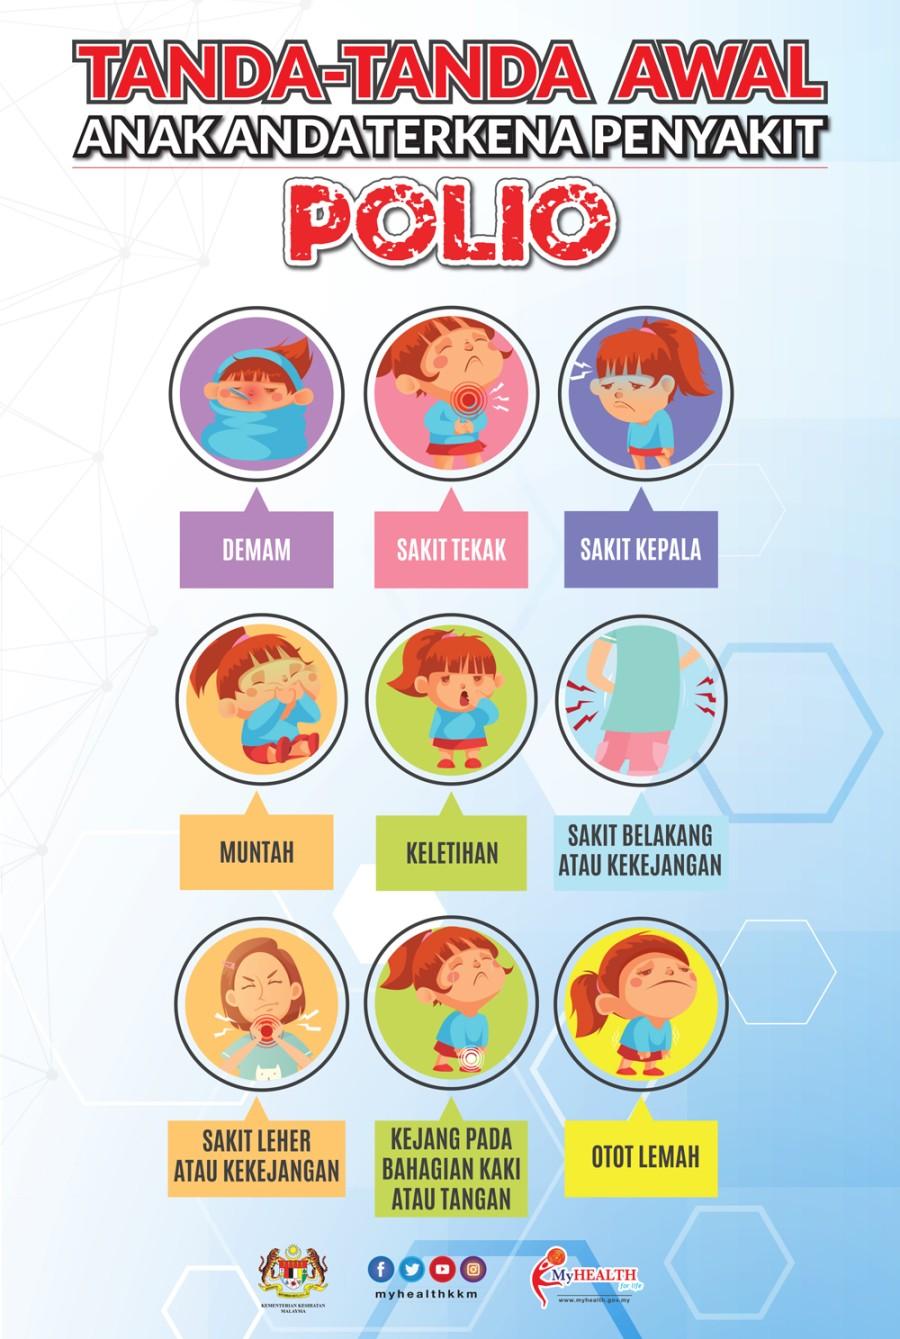 Tanda-Tanda Awal Polio